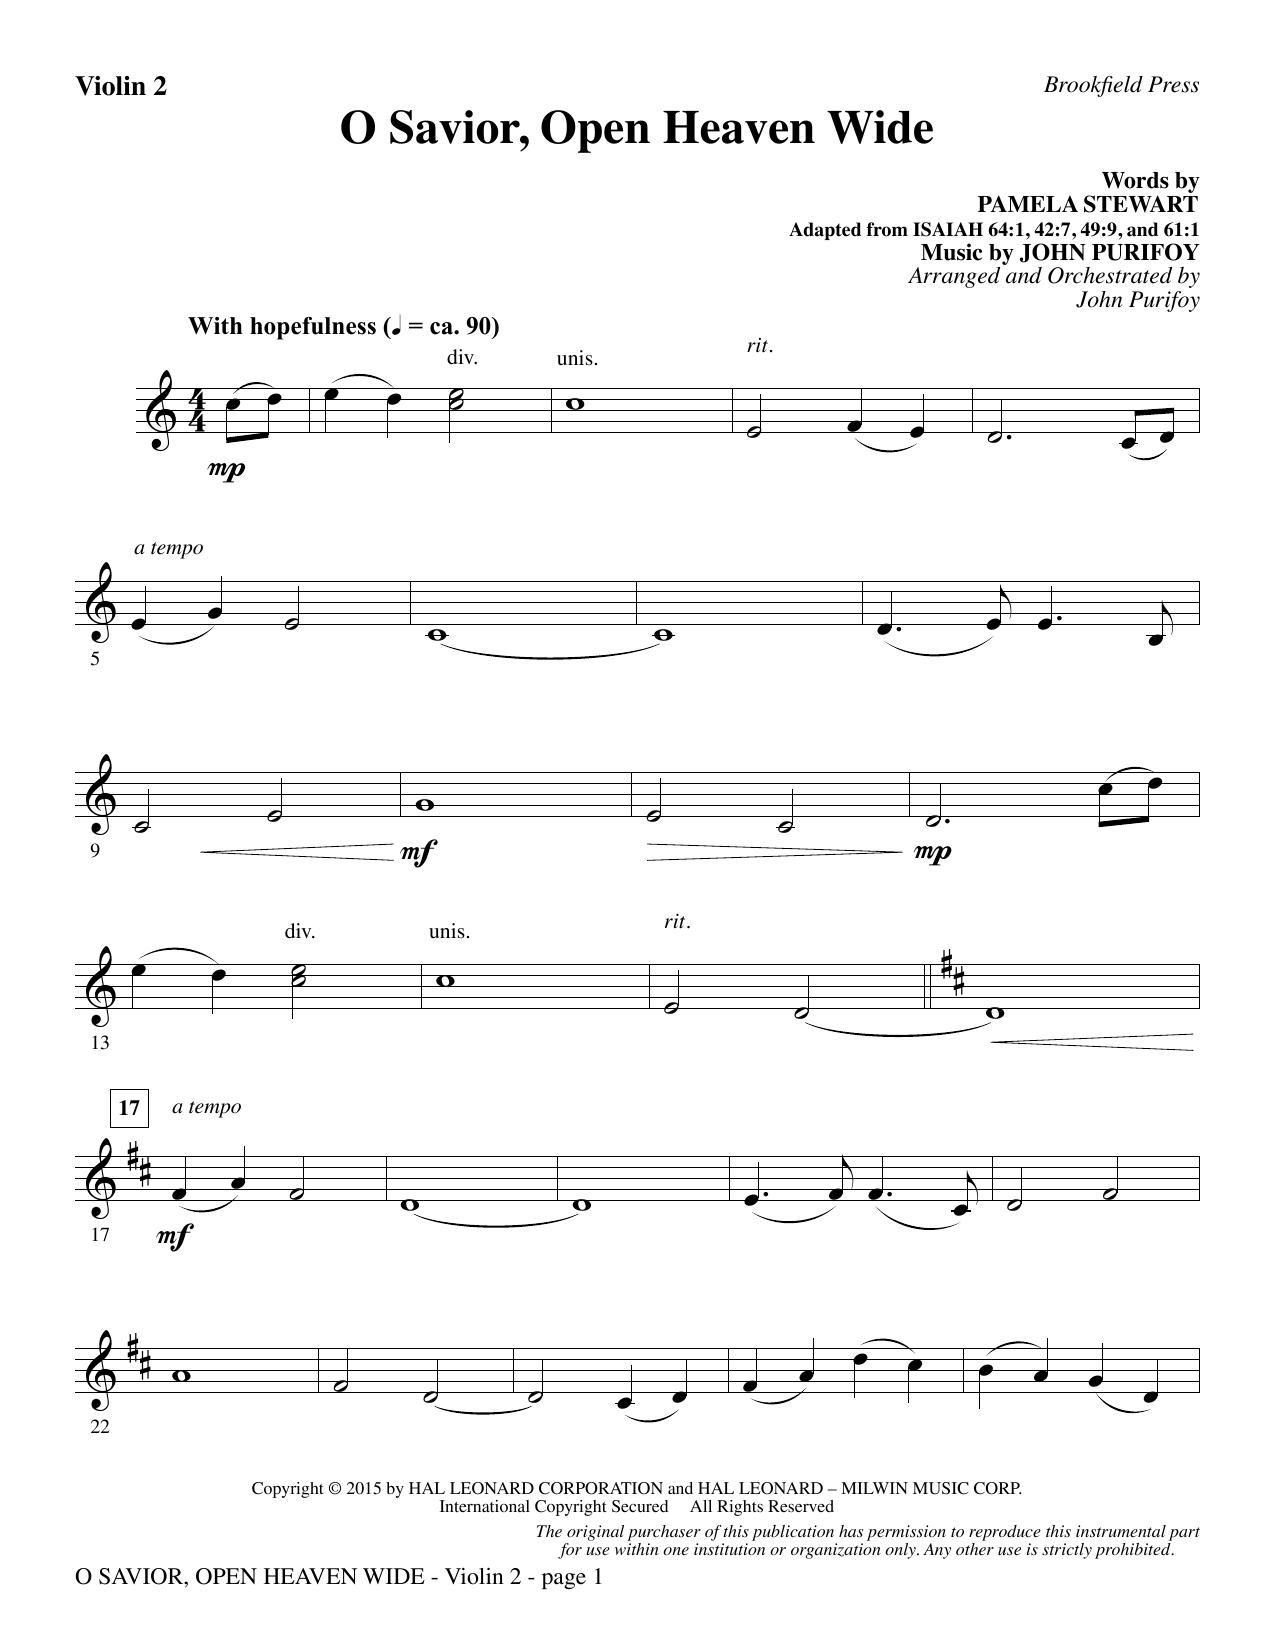 O Savior, Open Heaven Wide - Violin 2